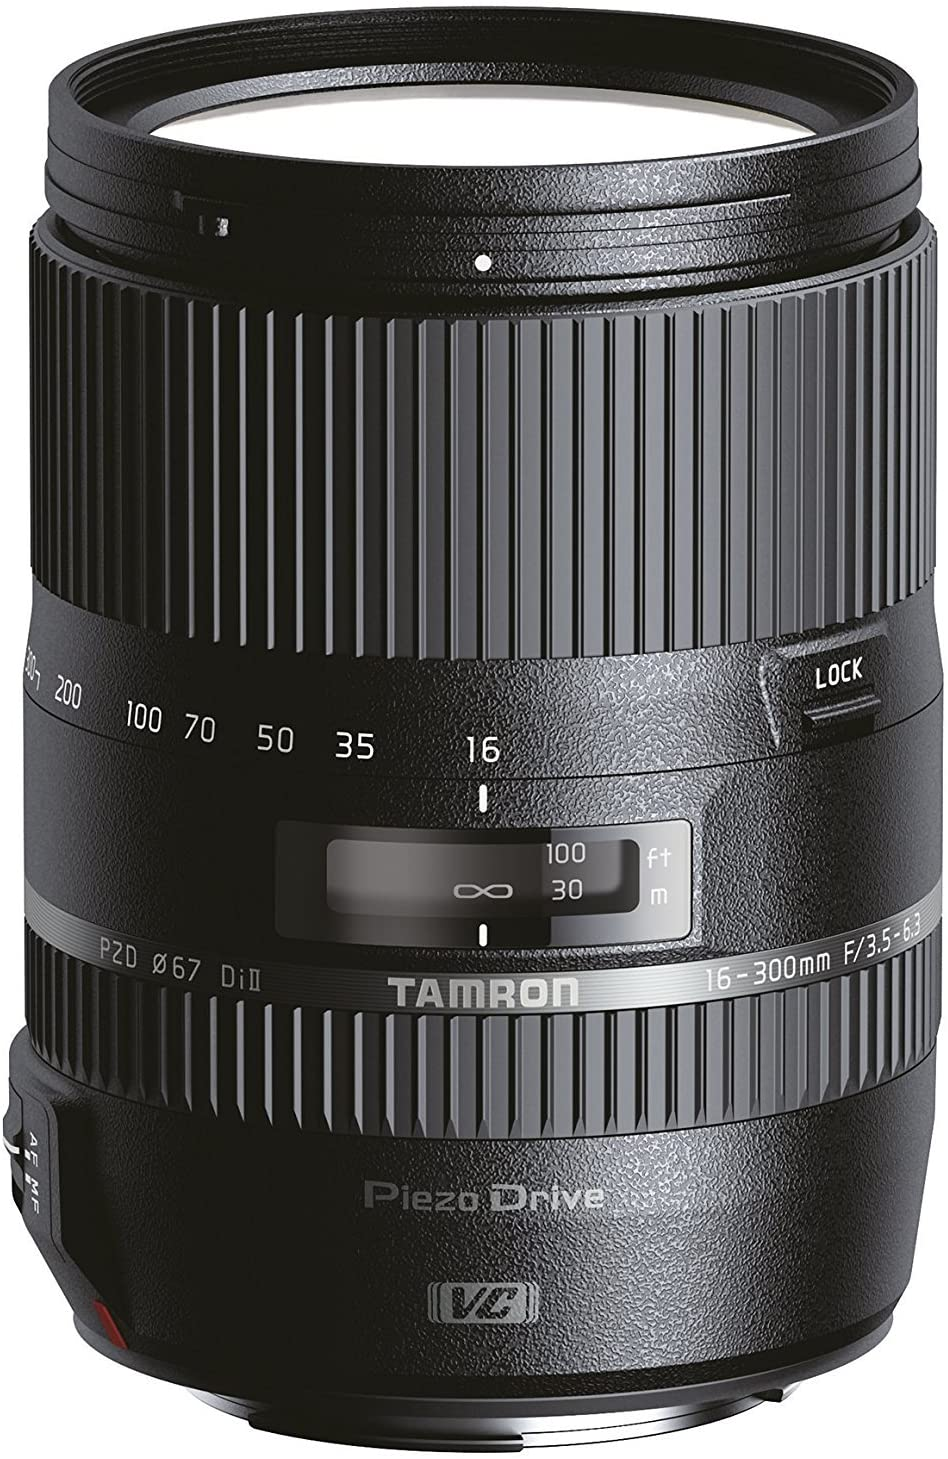 Tamron 16-300mm f/3.5-6.3 Di II VC PZD For Nikon F